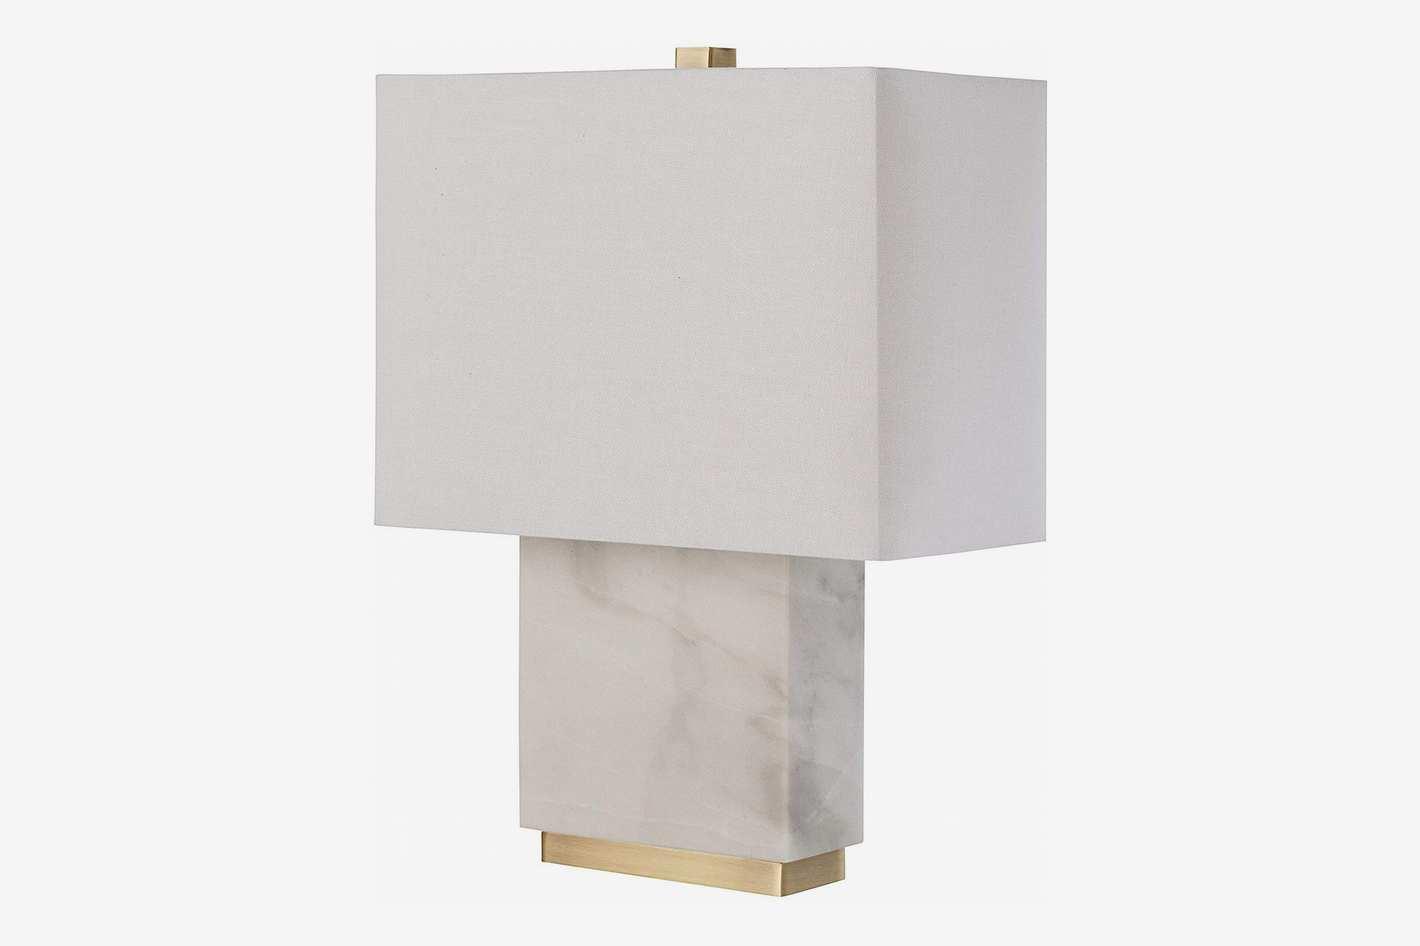 Rivet Mid-Century Modern Rectangle Table Lamp With LED Light Bulb